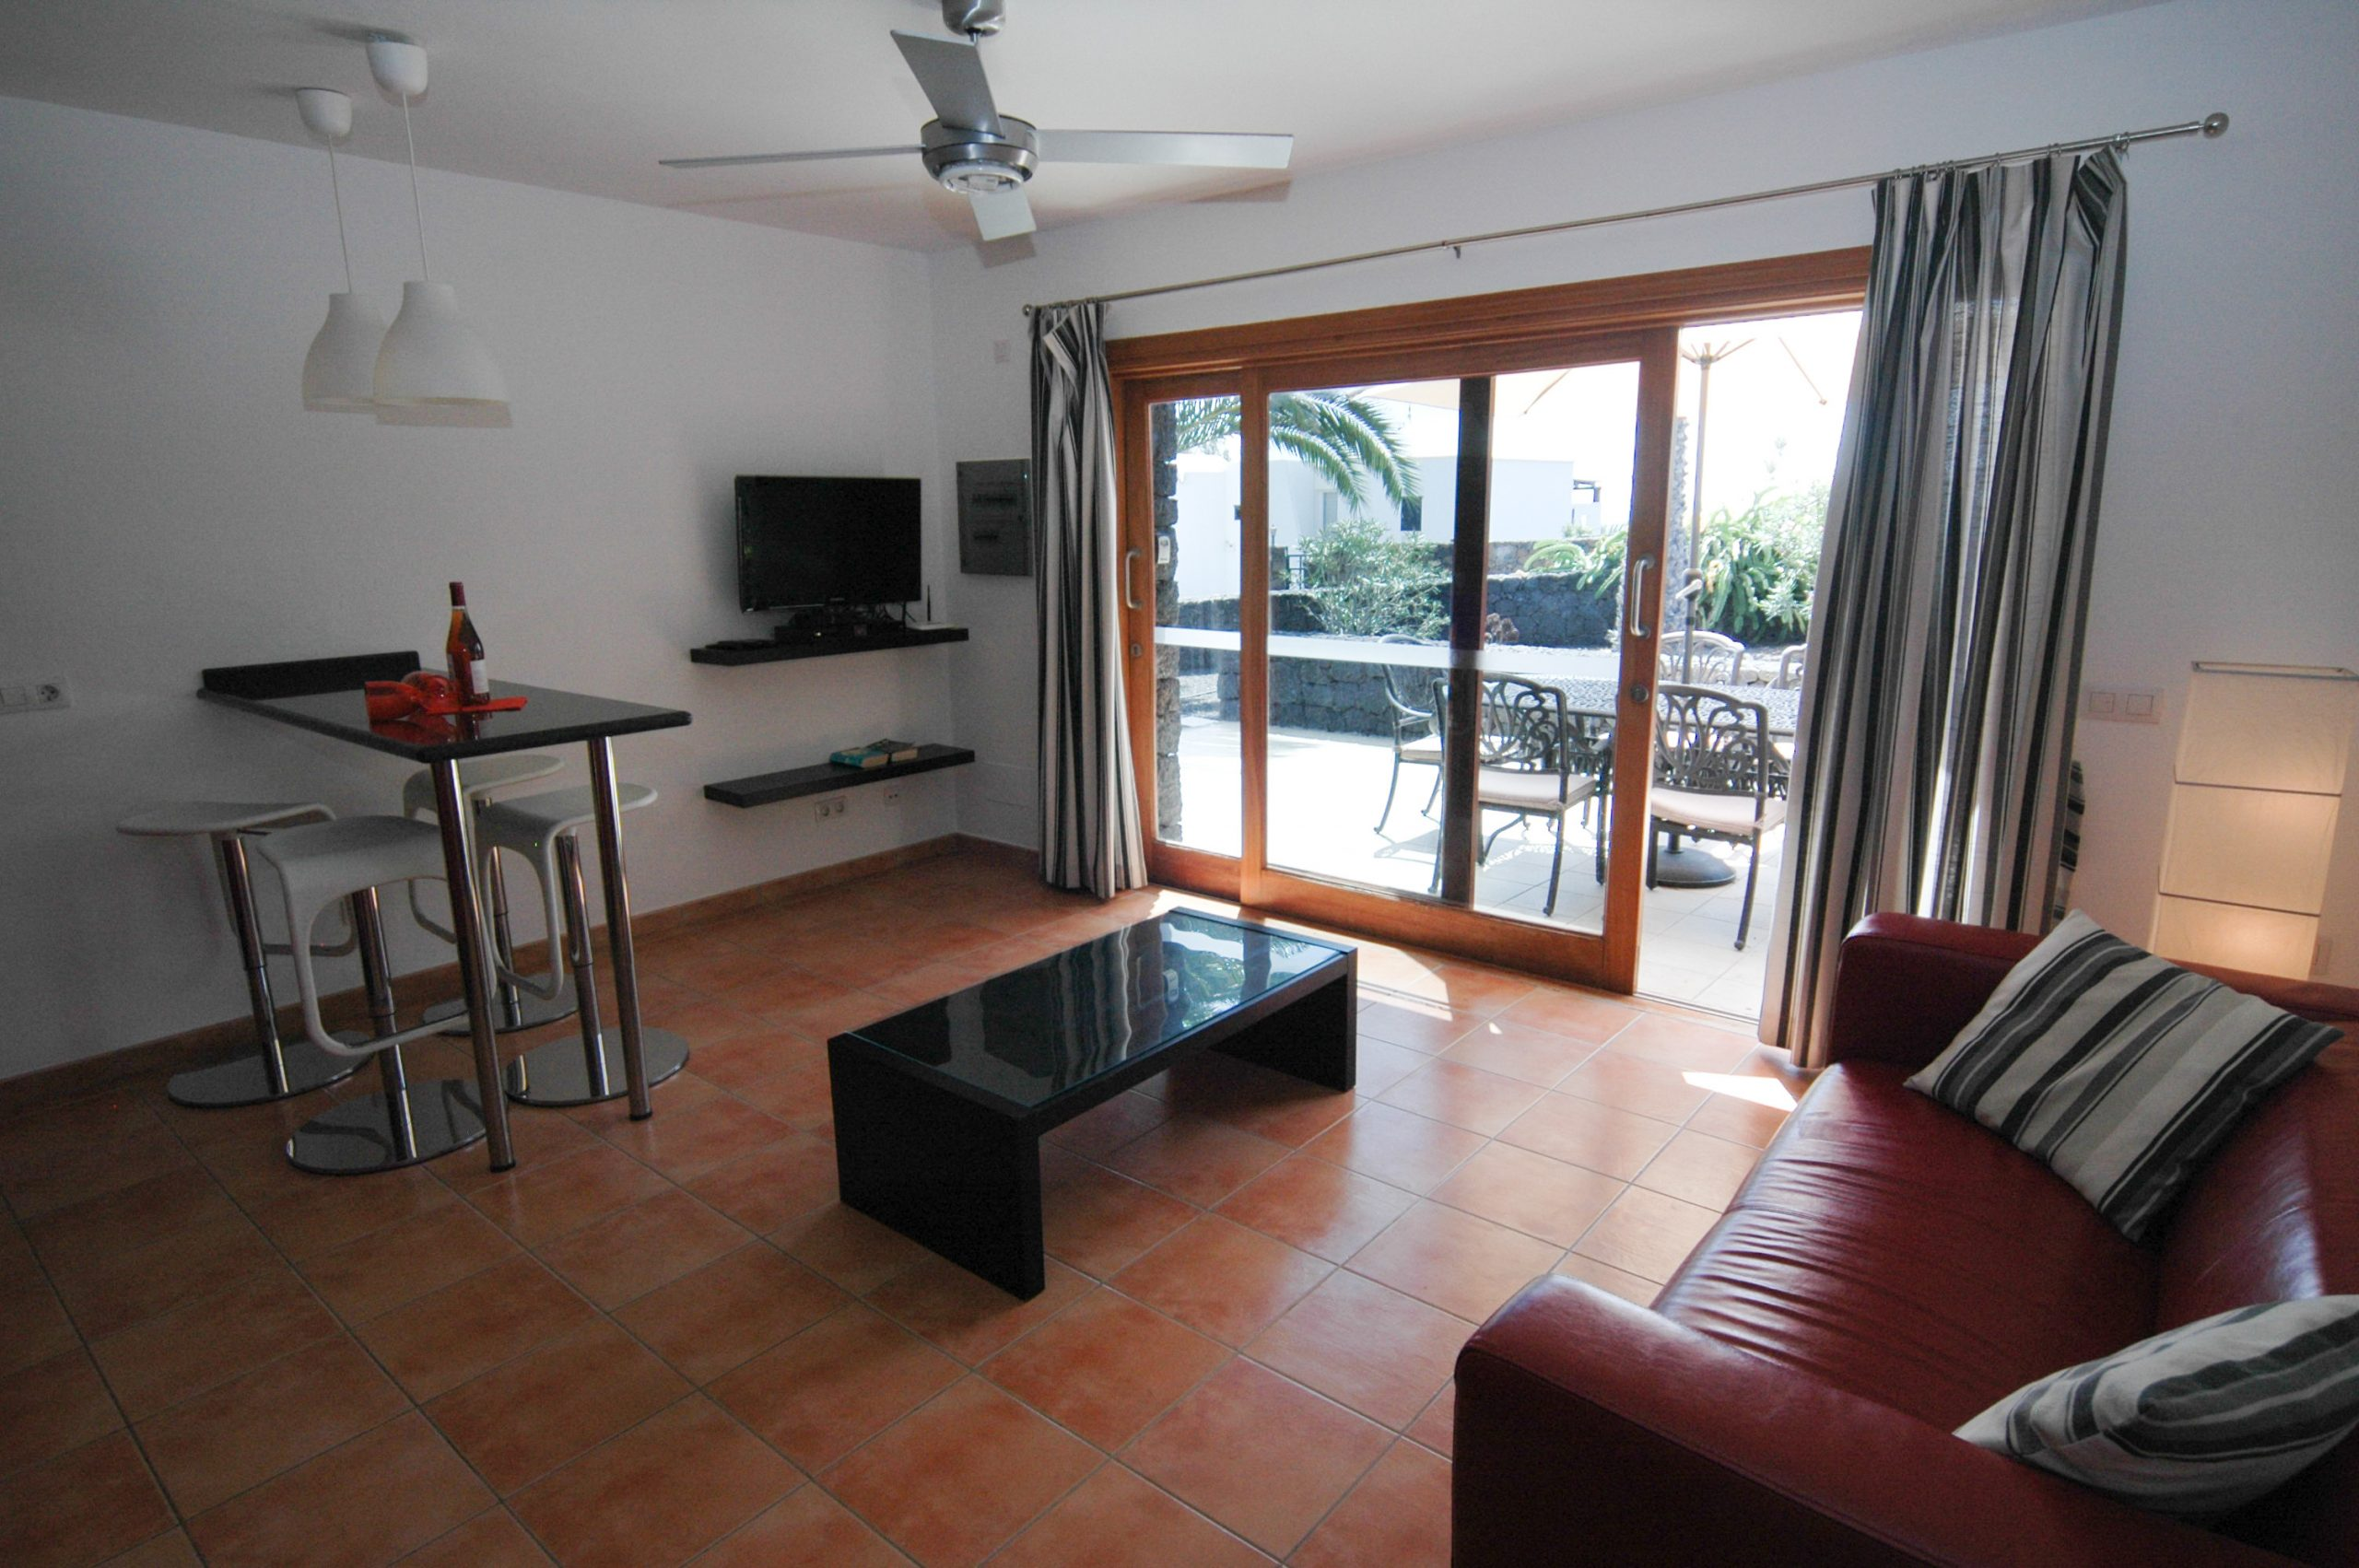 LVC216123 Annexe Apartment